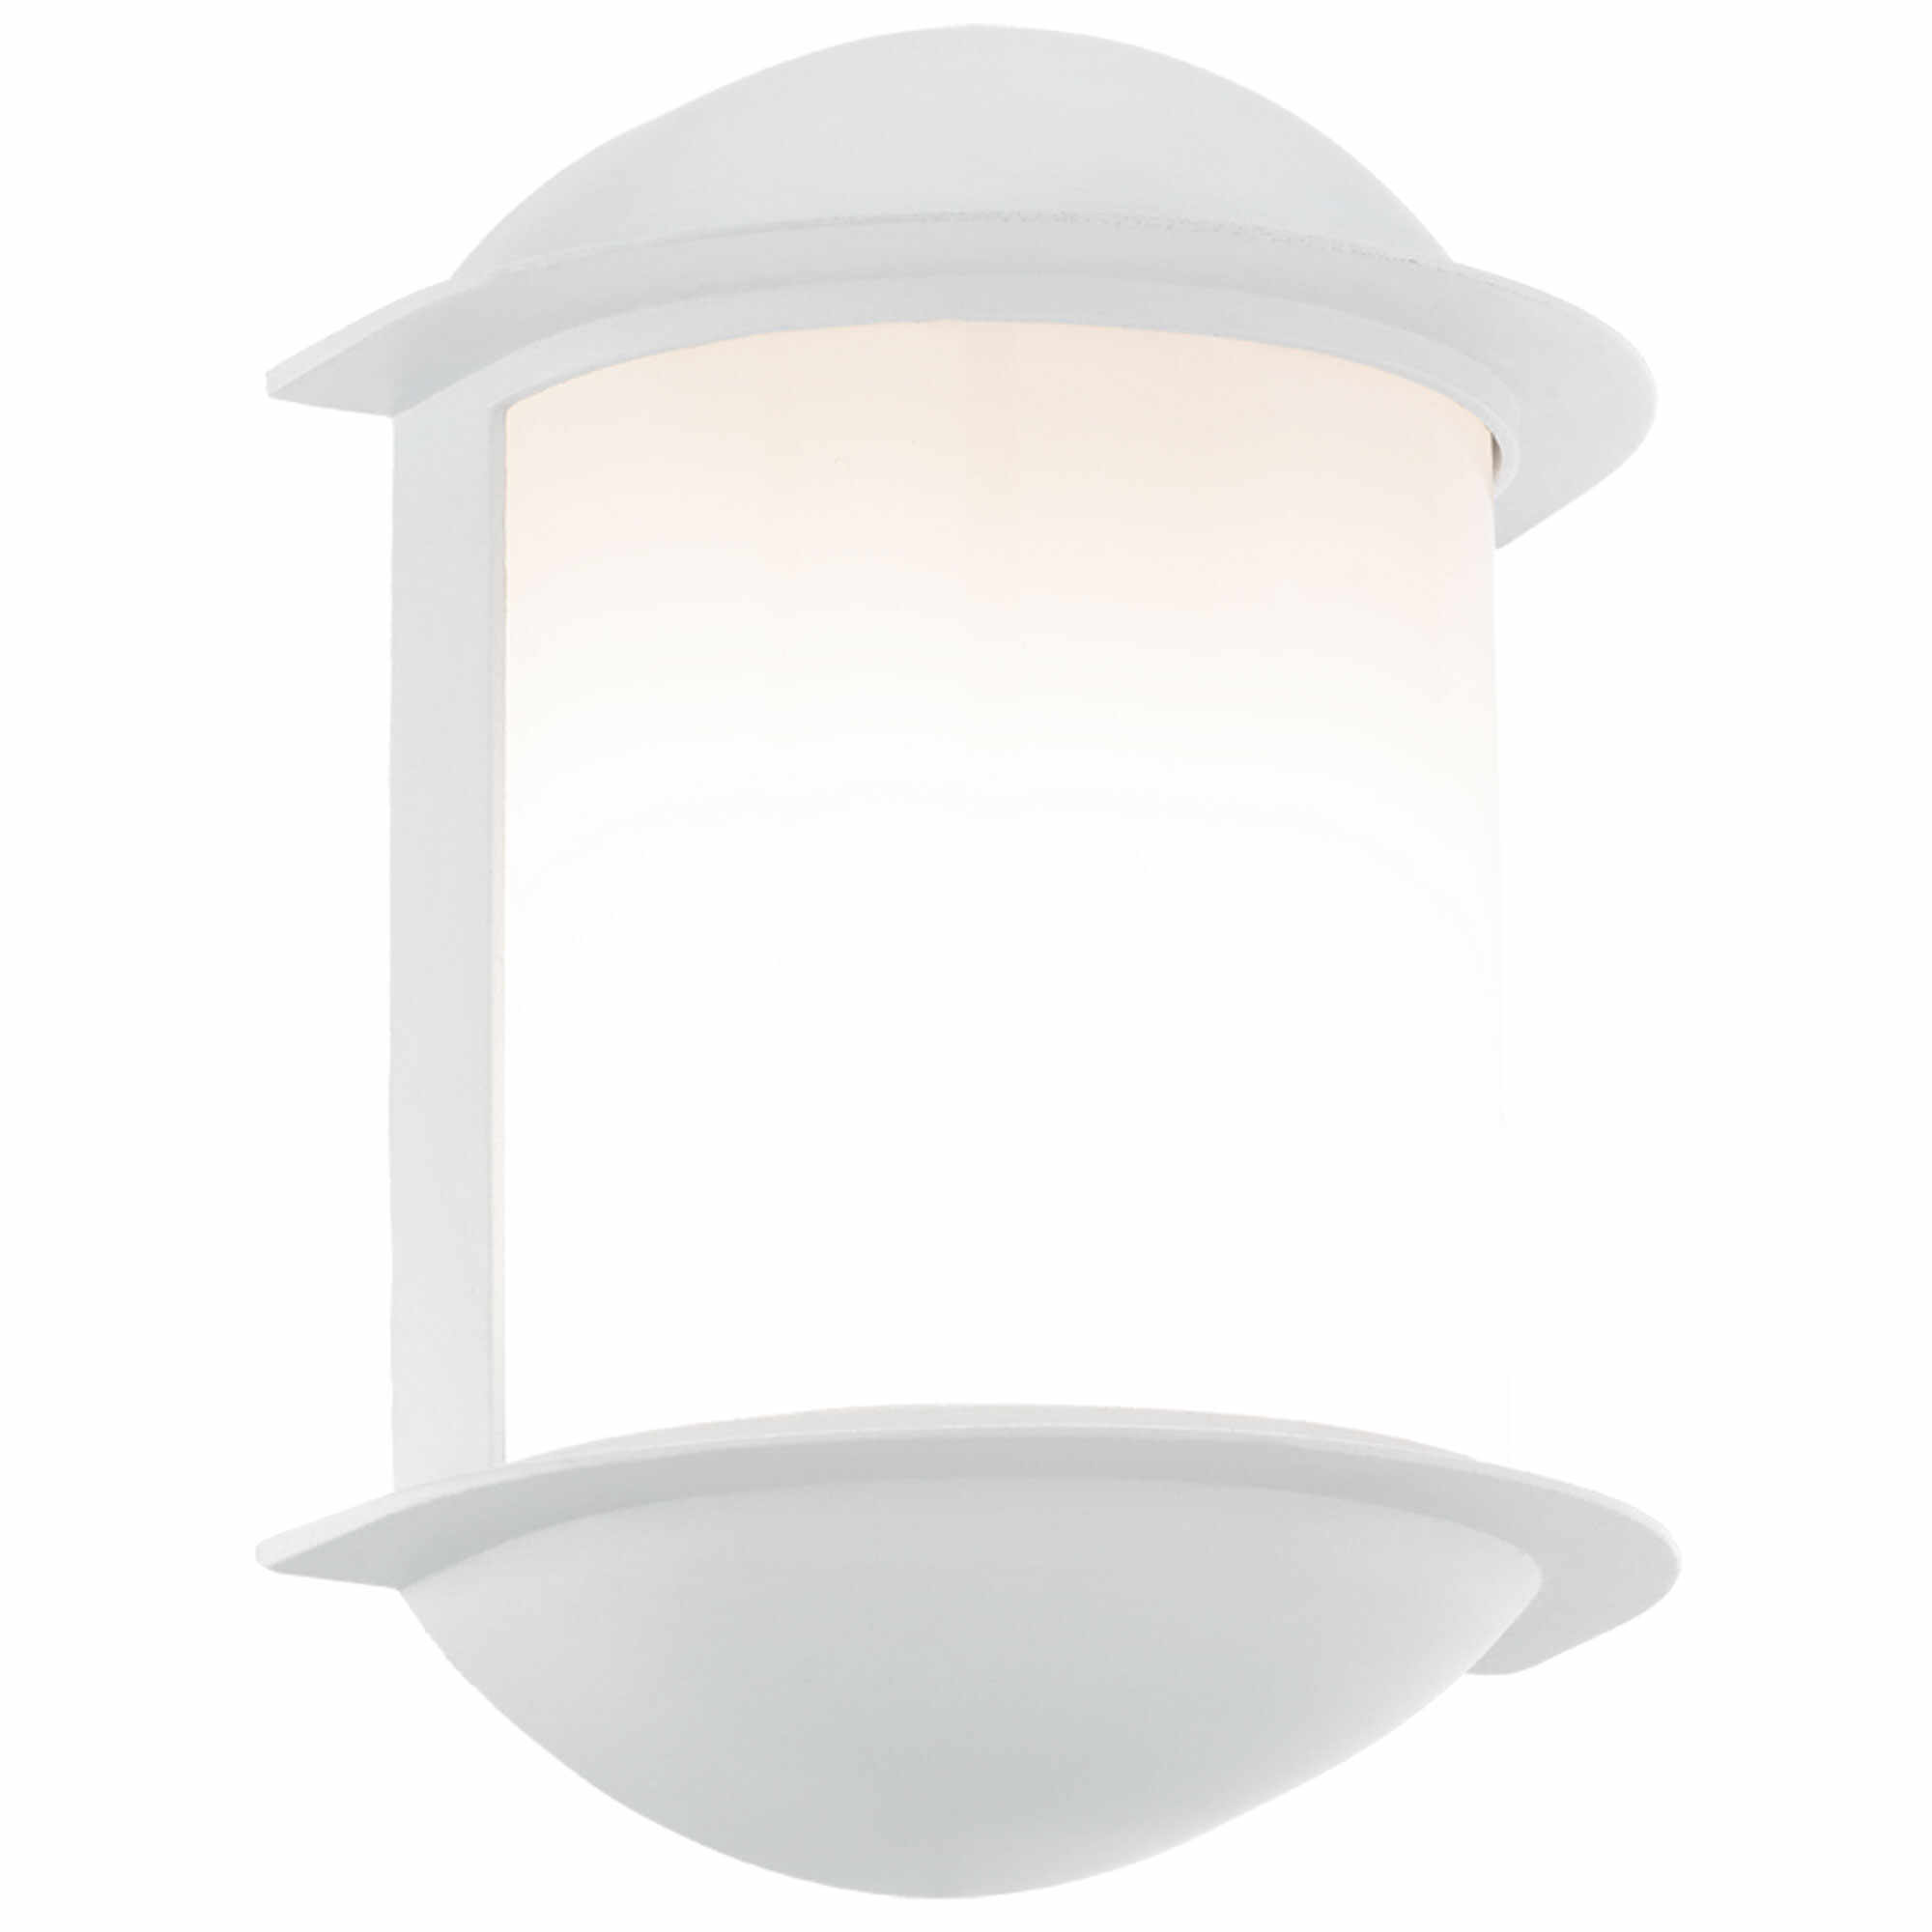 Aplica de exterior cu LED Eglo Modern Isoba 1x7W 16x22x10cm aluminiu alb la pret 164.42 lei